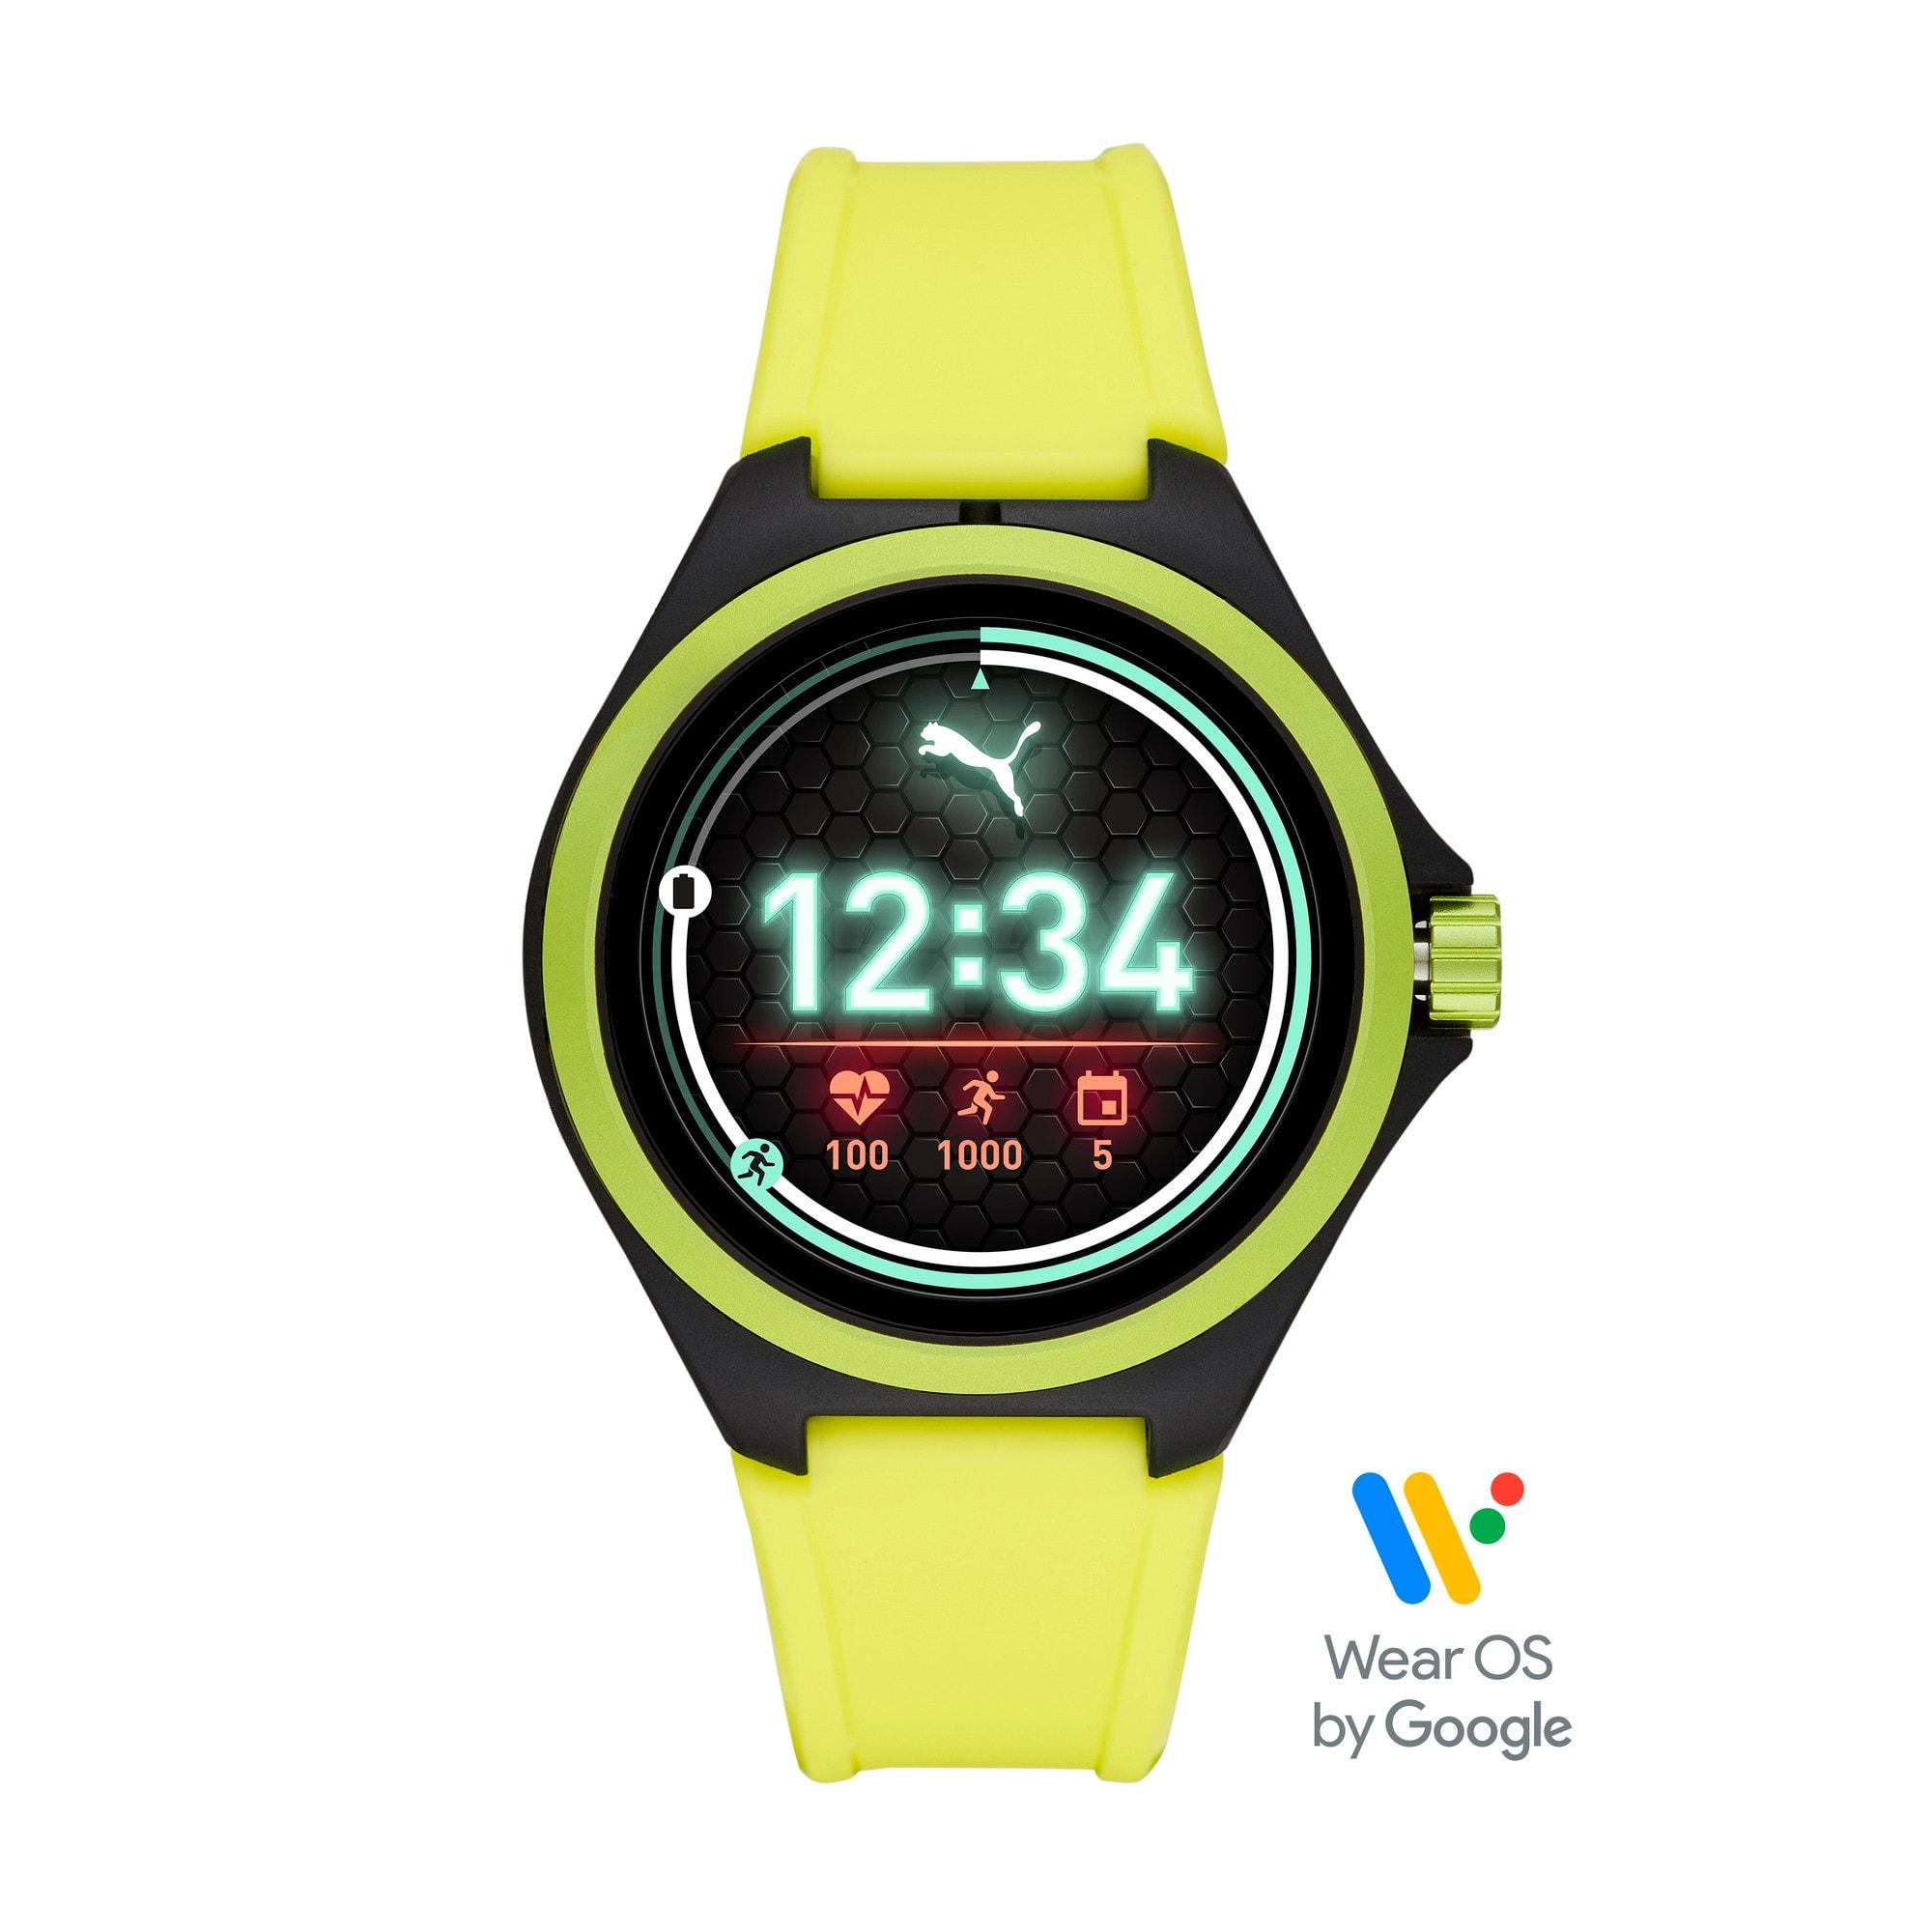 Thumbnail 1 of PUMA Smartwatch, Yellow/Black, medium